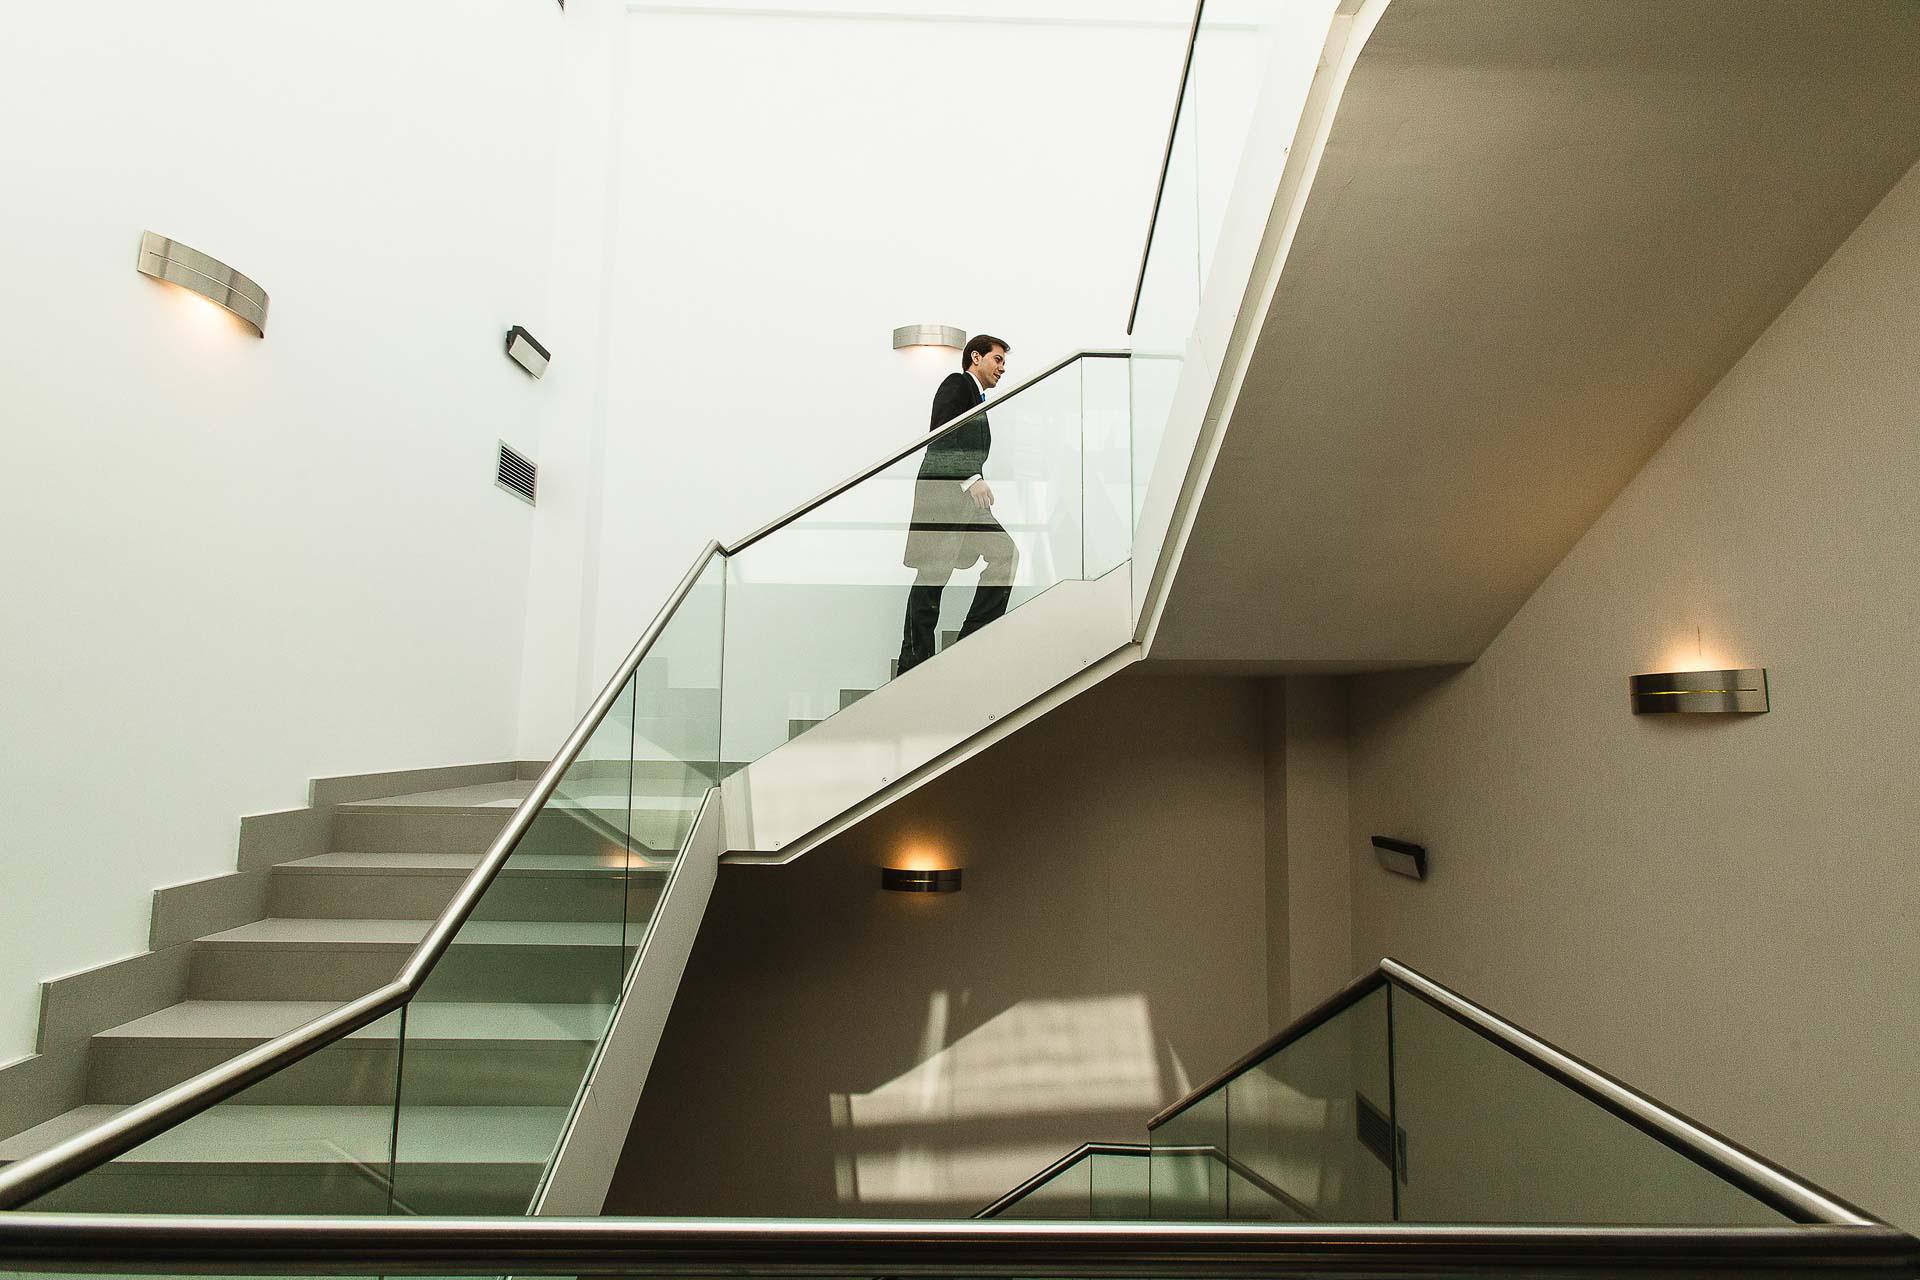 Boda Huesca Hotel Abba Retrato Novio Escaleras